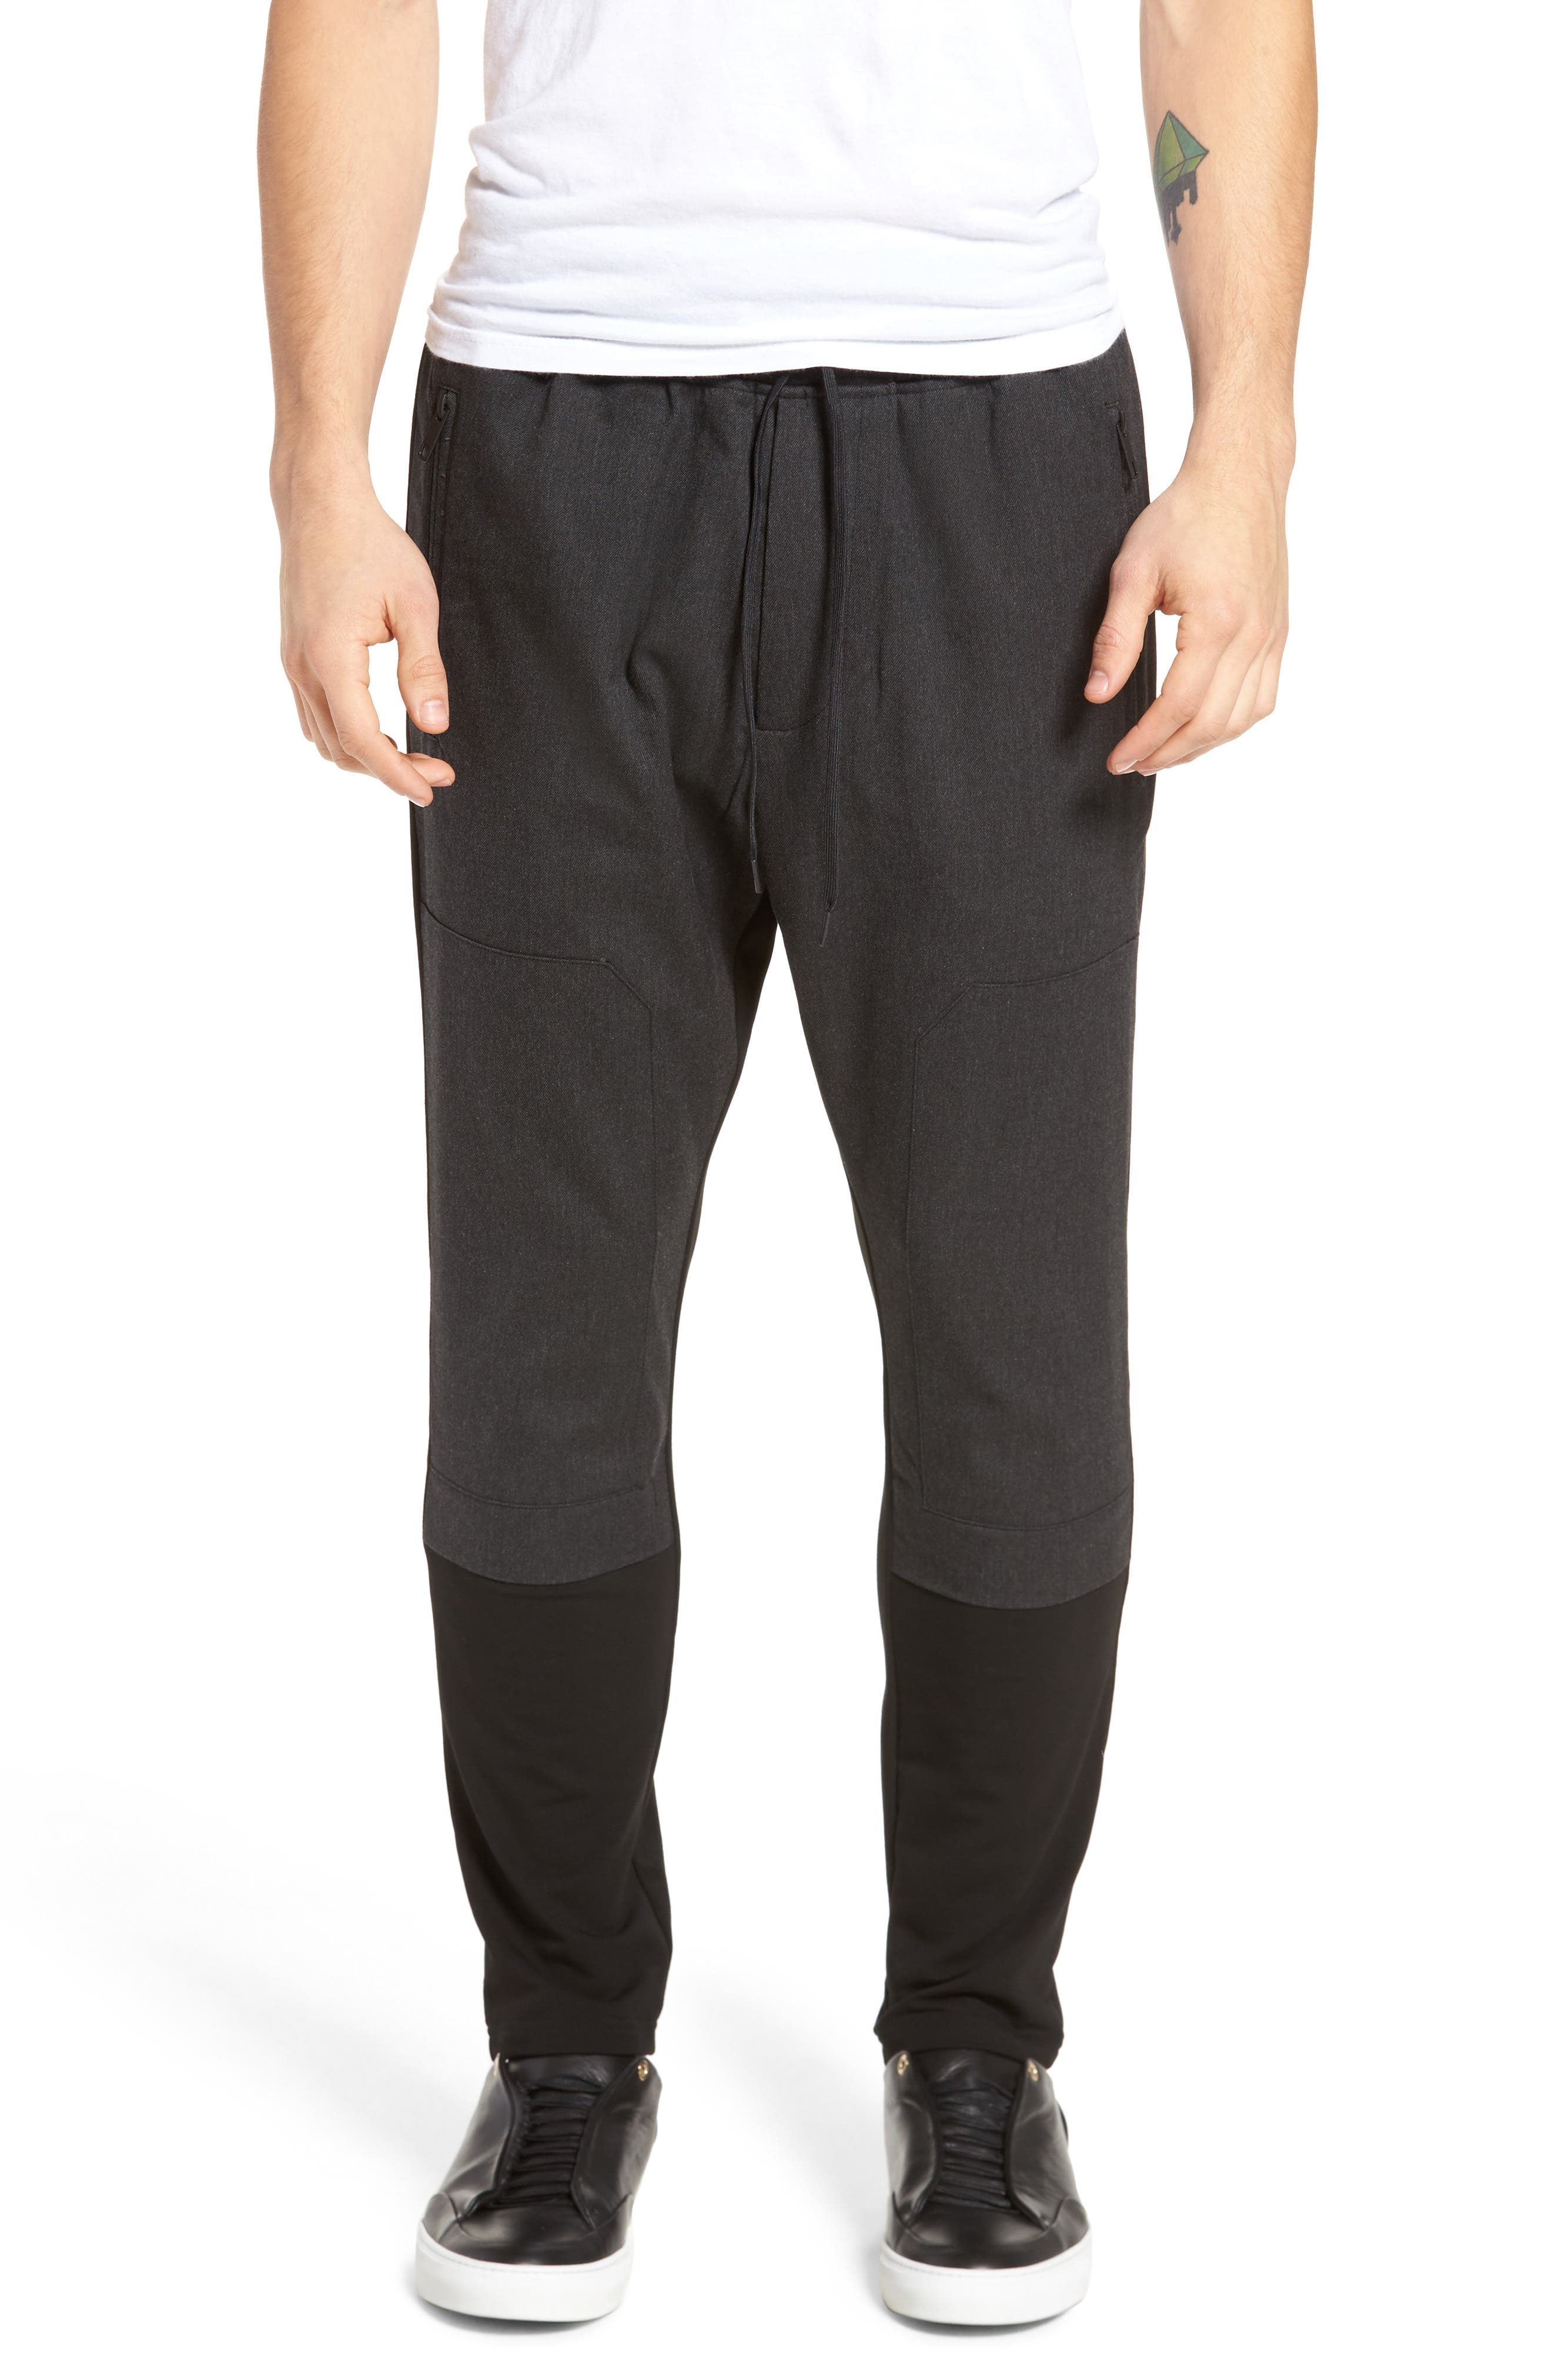 Alternate Image 1 Selected - Antony Morato Fleece Pants